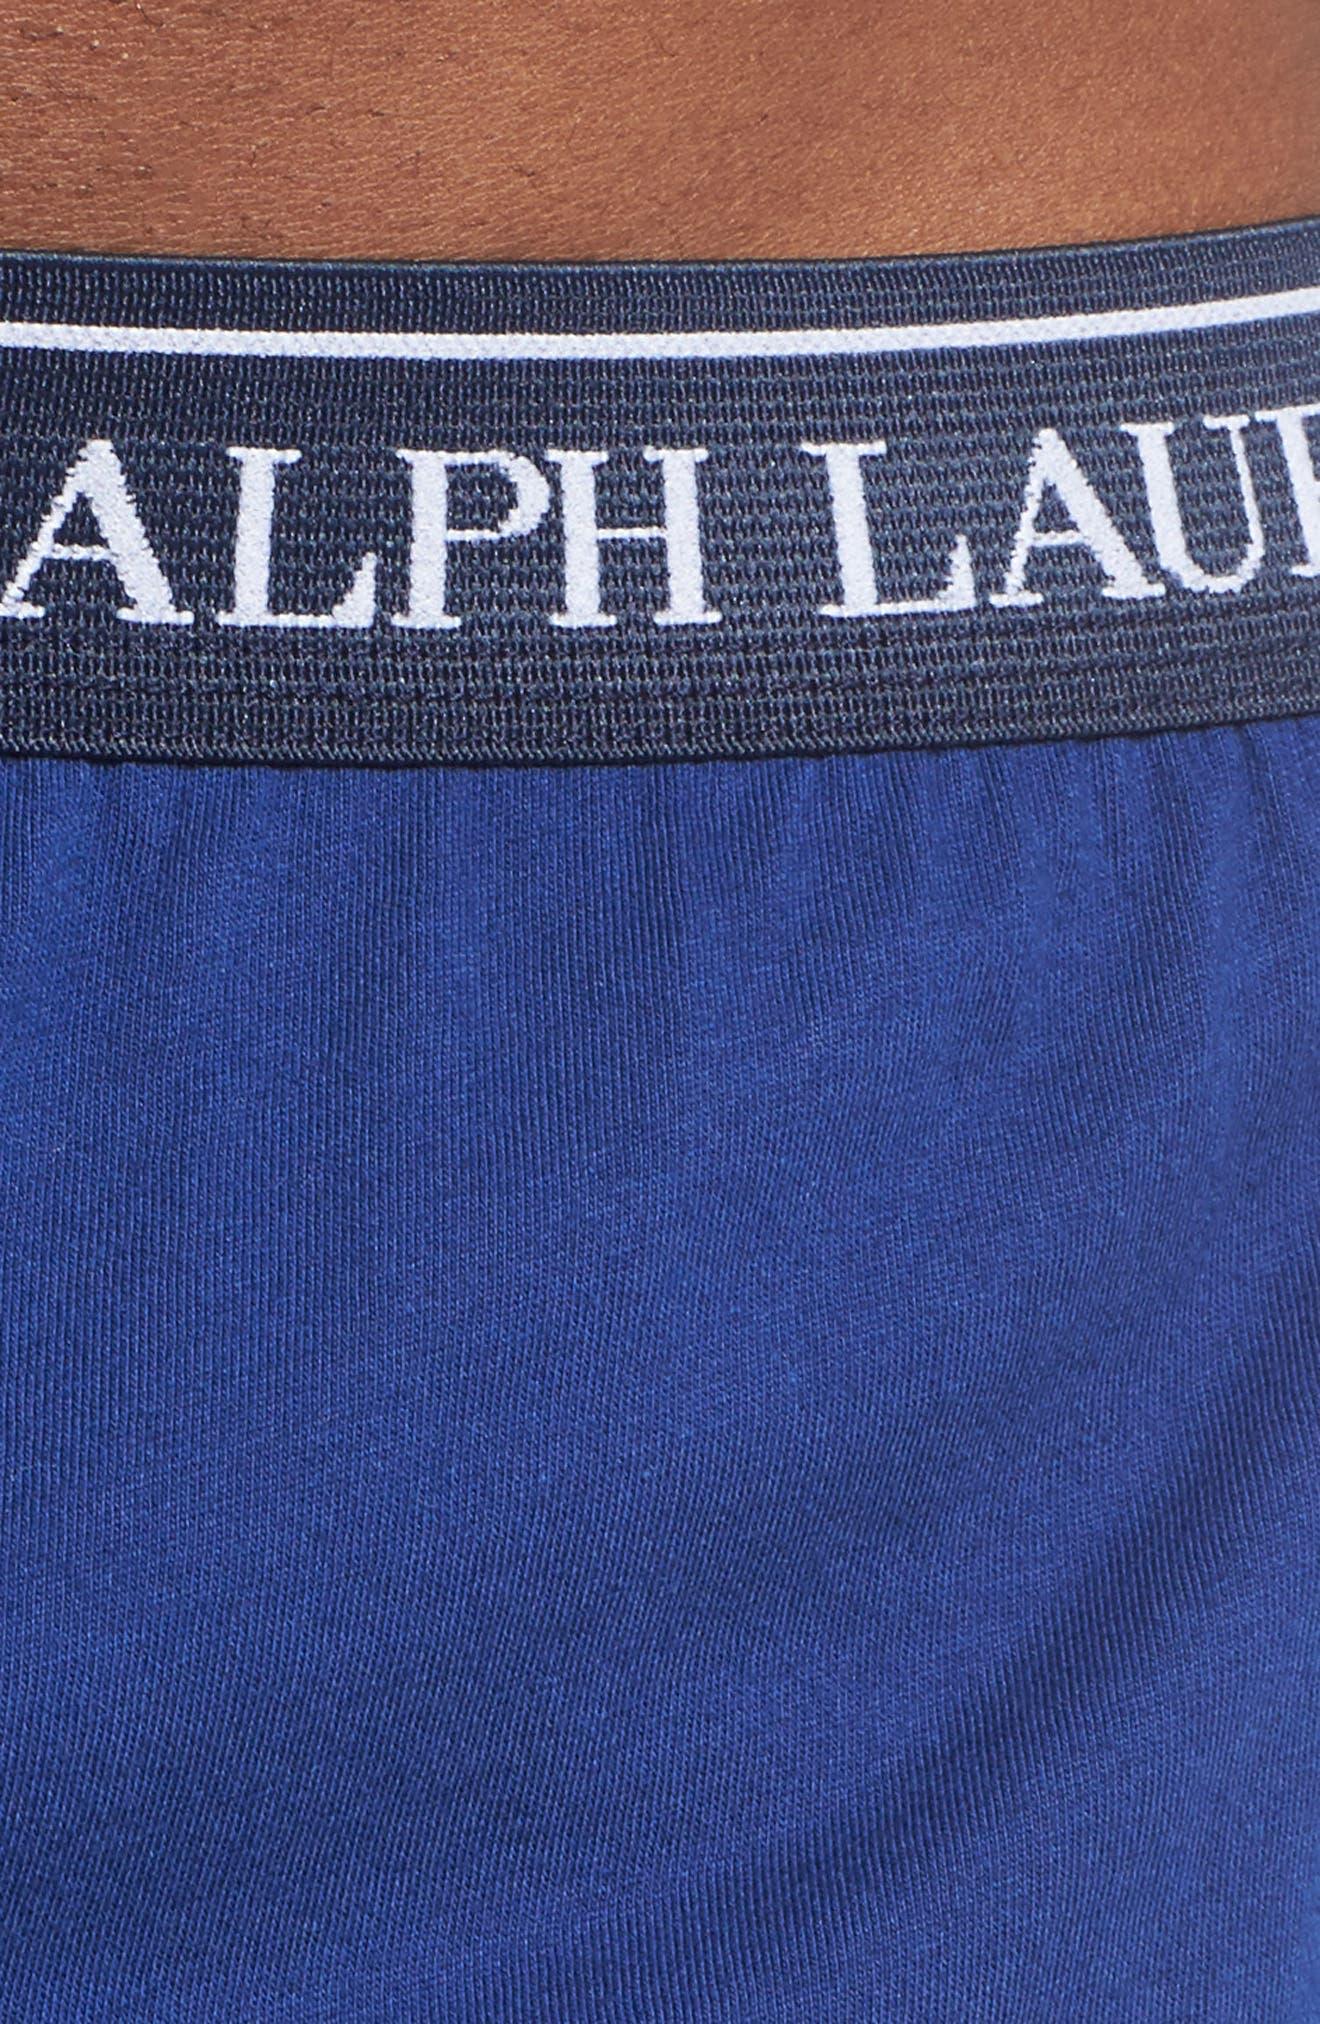 5-Pack Cotton Boxers,                             Alternate thumbnail 5, color,                             BLUE/ ROYAL BLUE/ NAVY